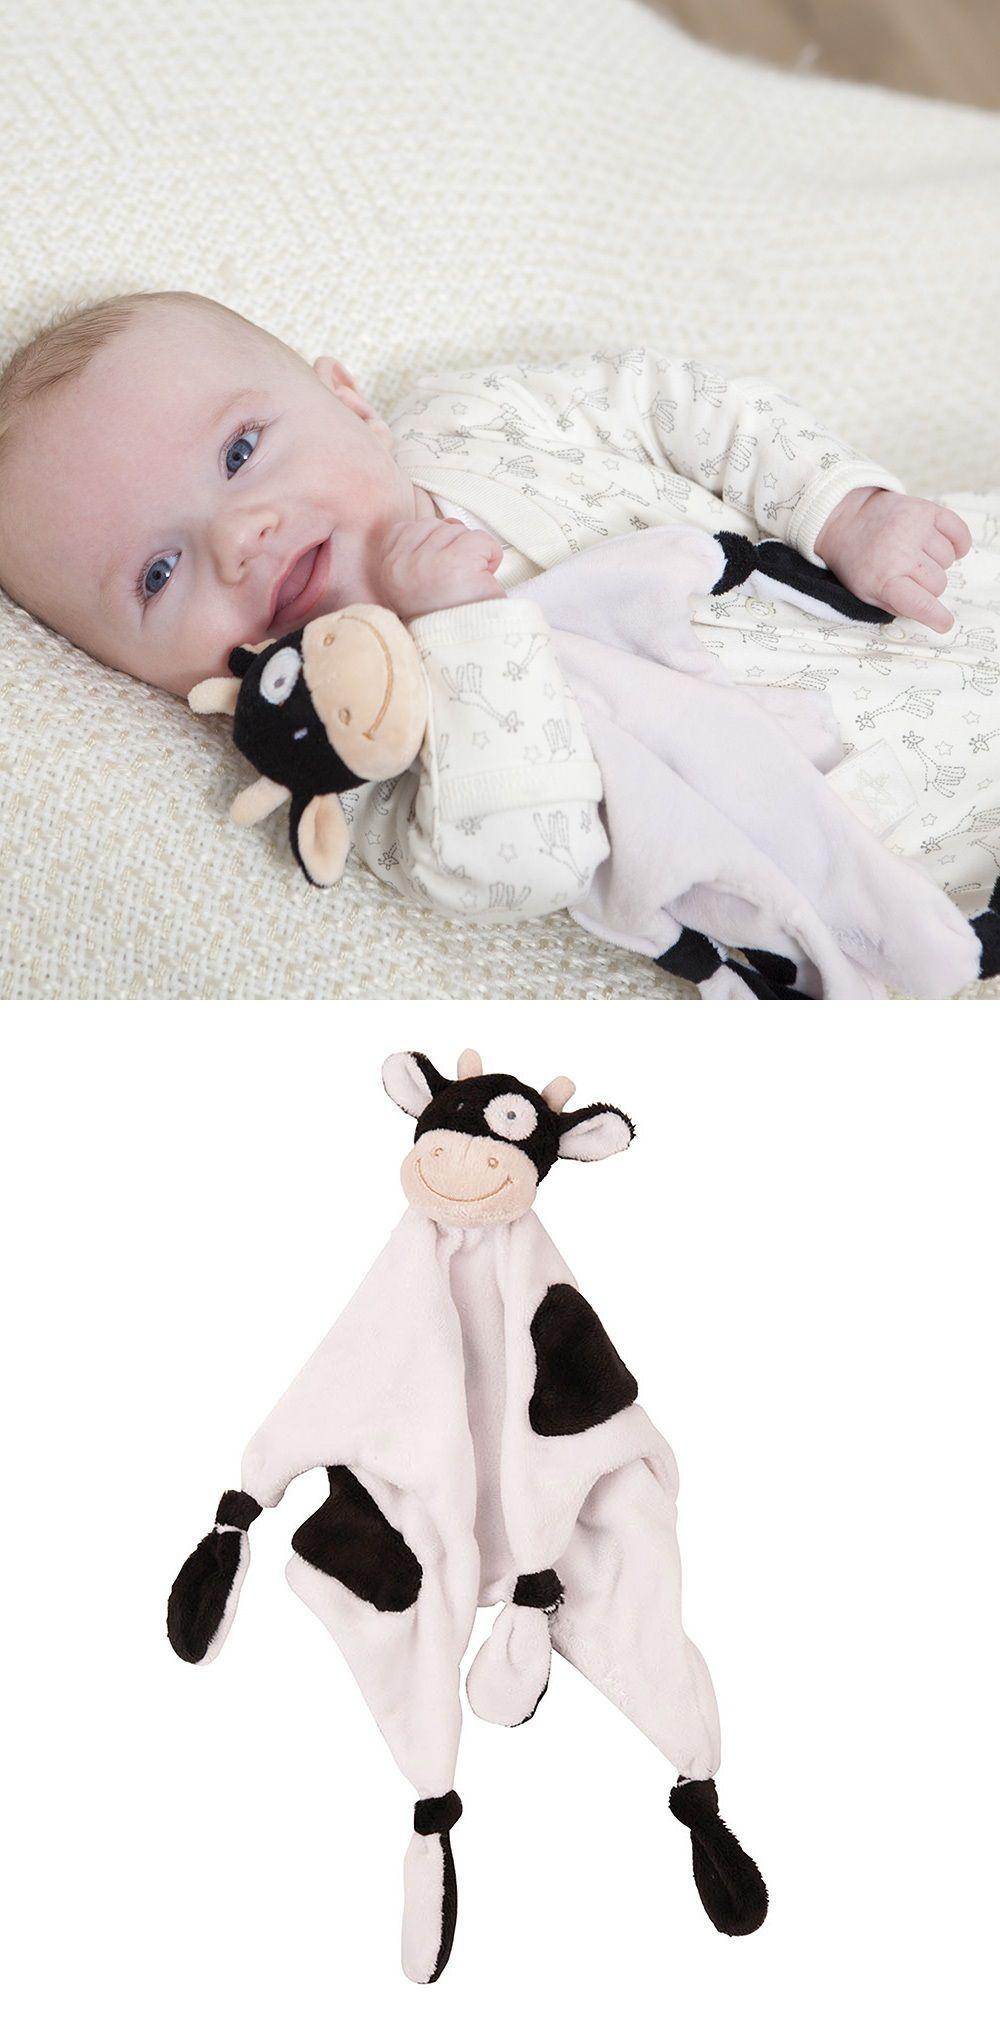 JoJo Maman Bebe Cow Baby forter Baby Gift Ideas